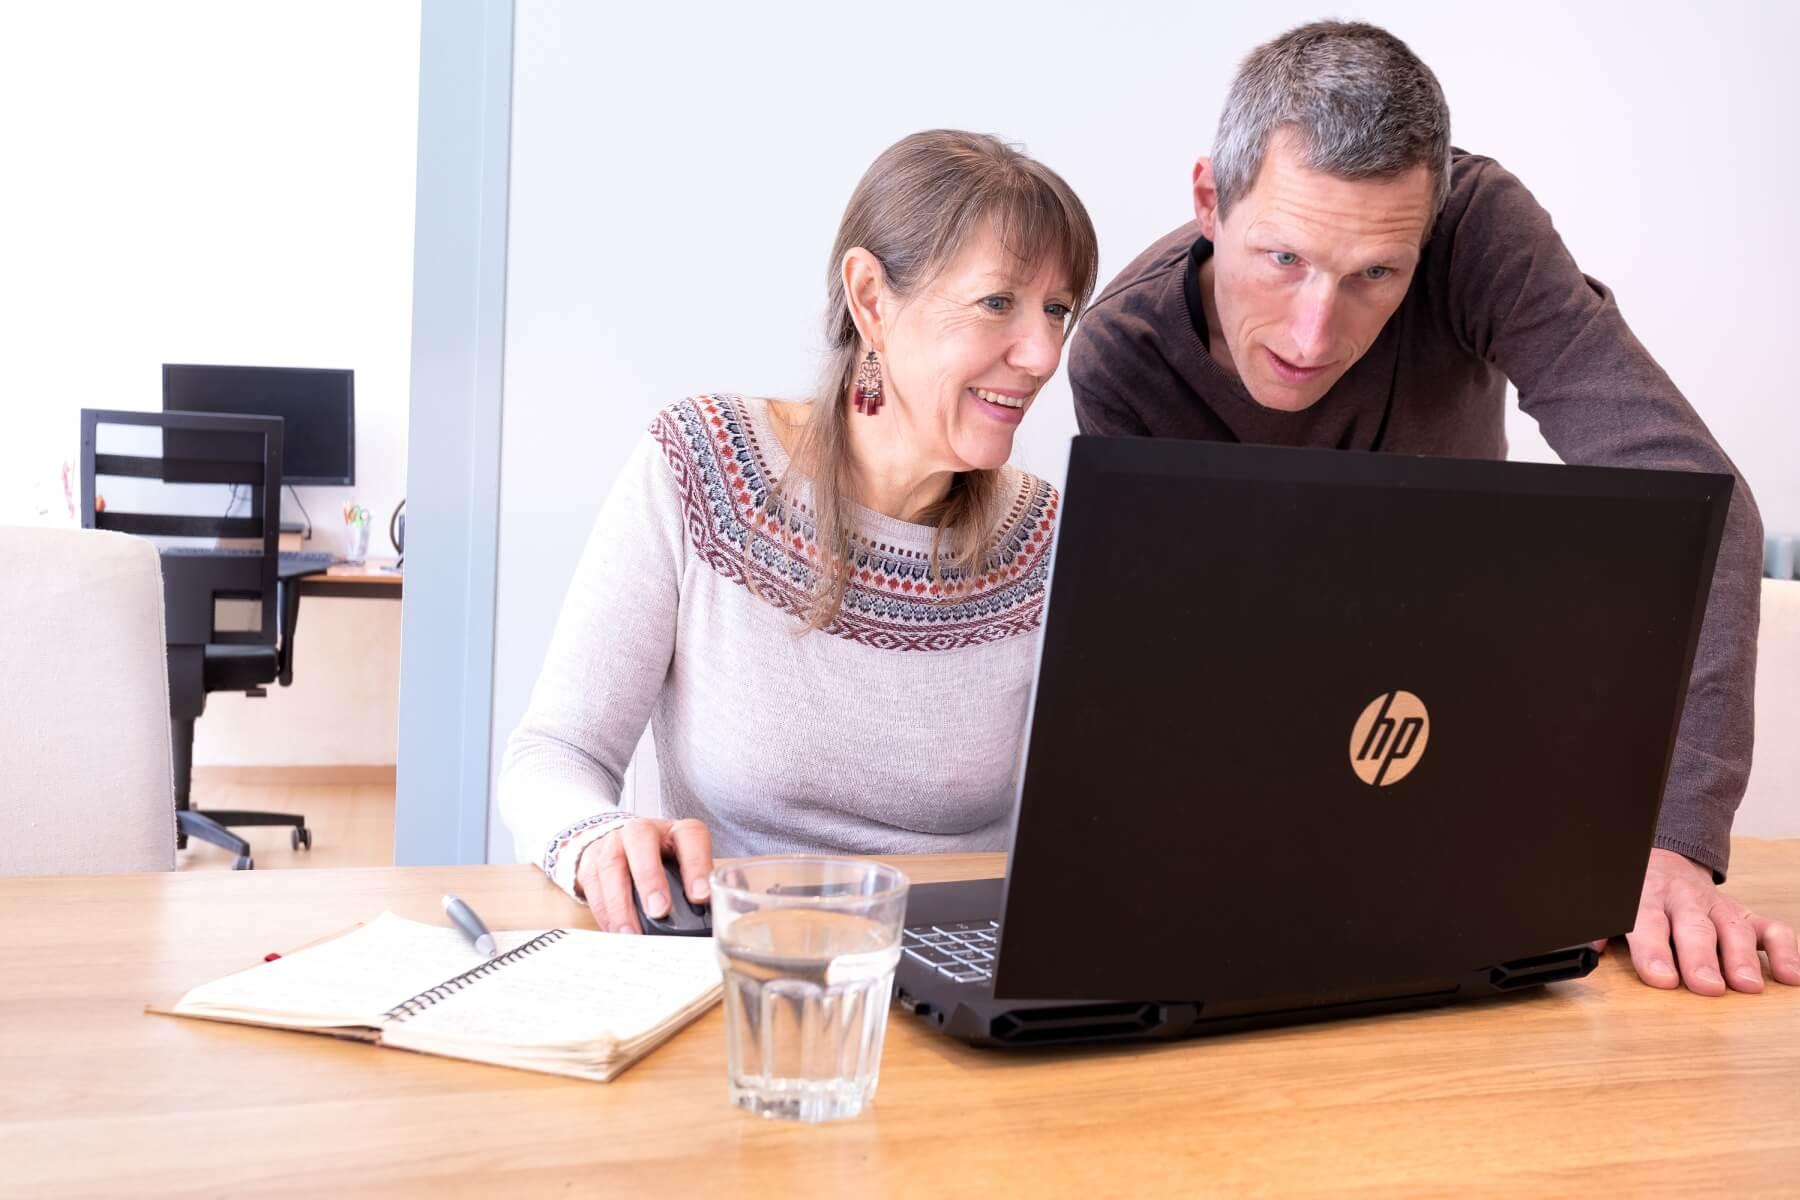 Erwin Derksen en Margriet Ravensbergen samen achter computer